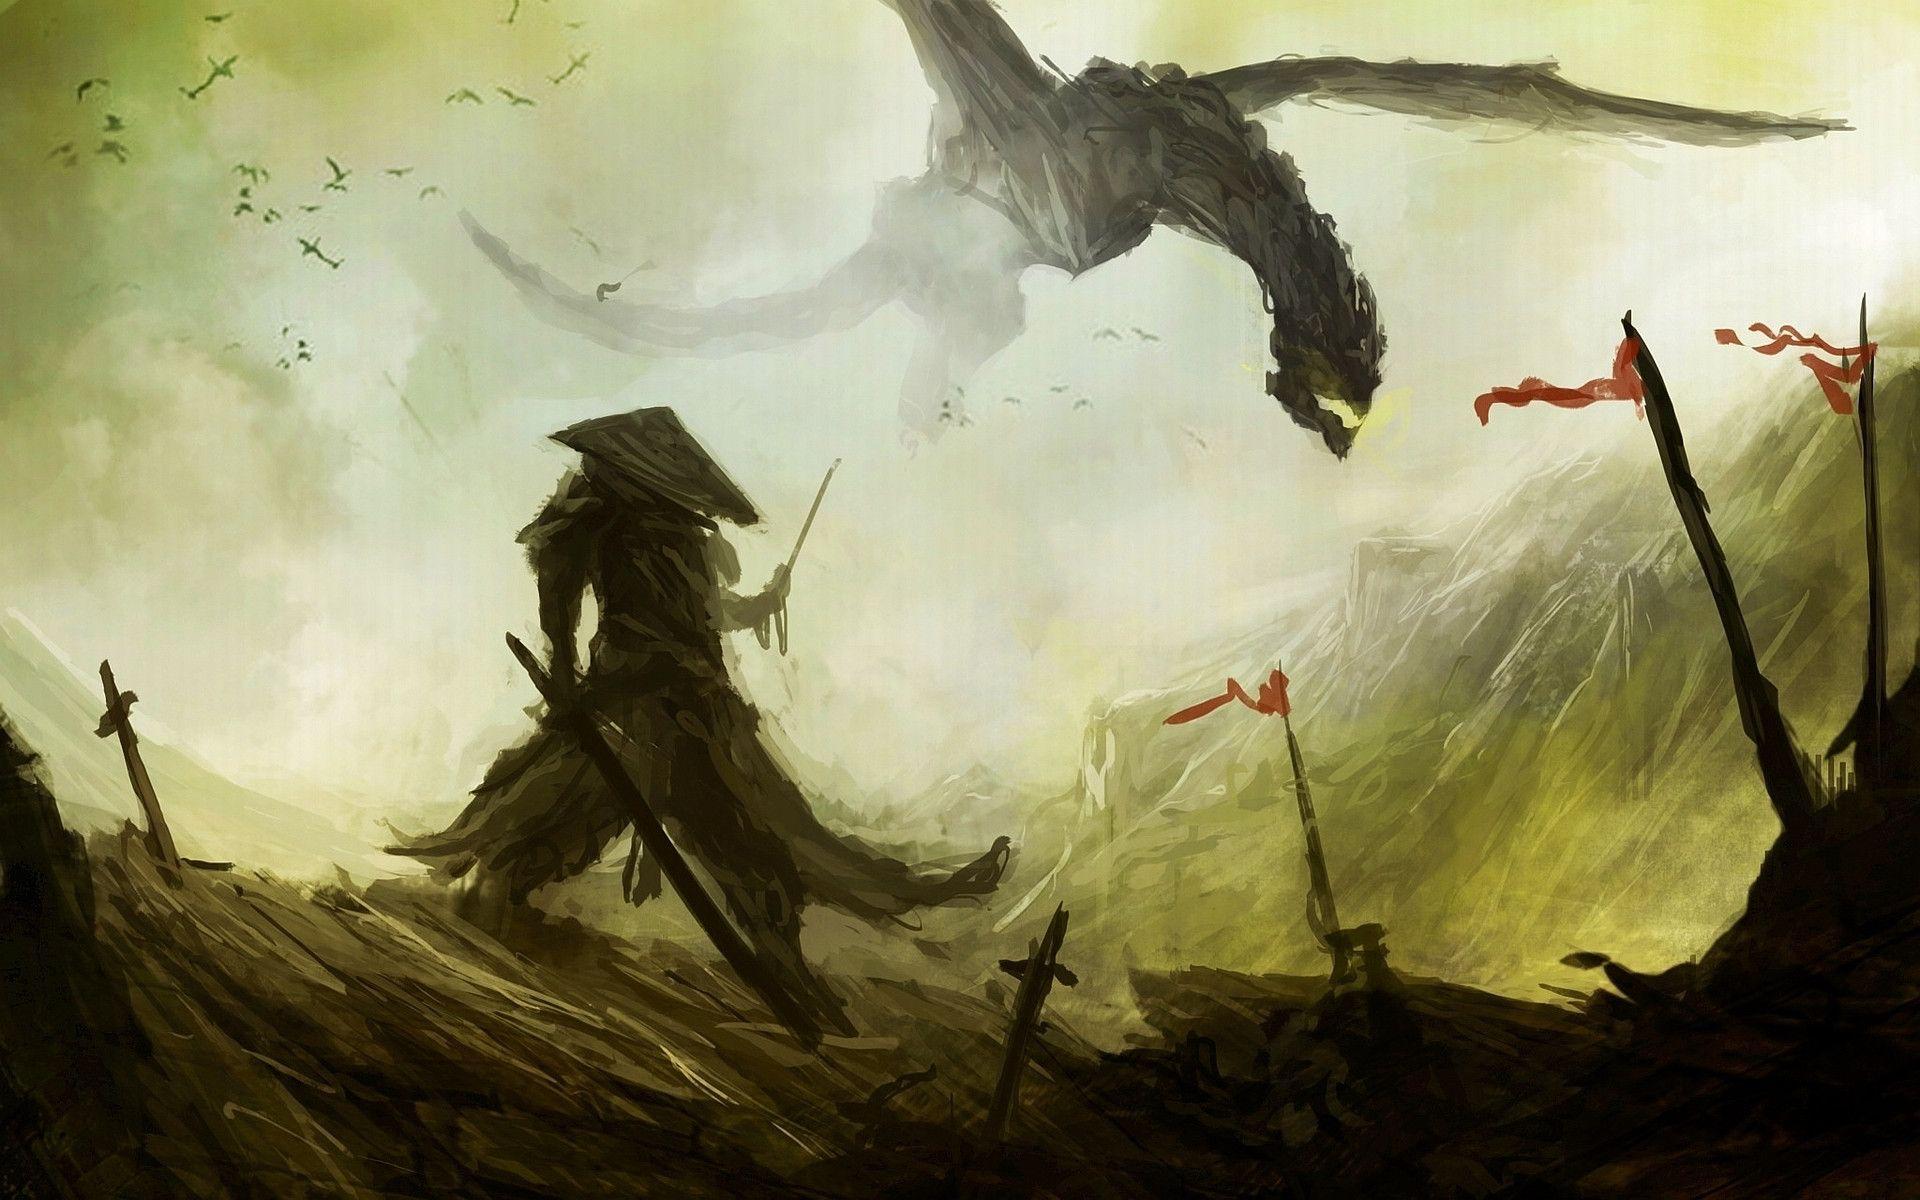 4k Samurai Fights Wallpapers Top Free 4k Samurai Fights